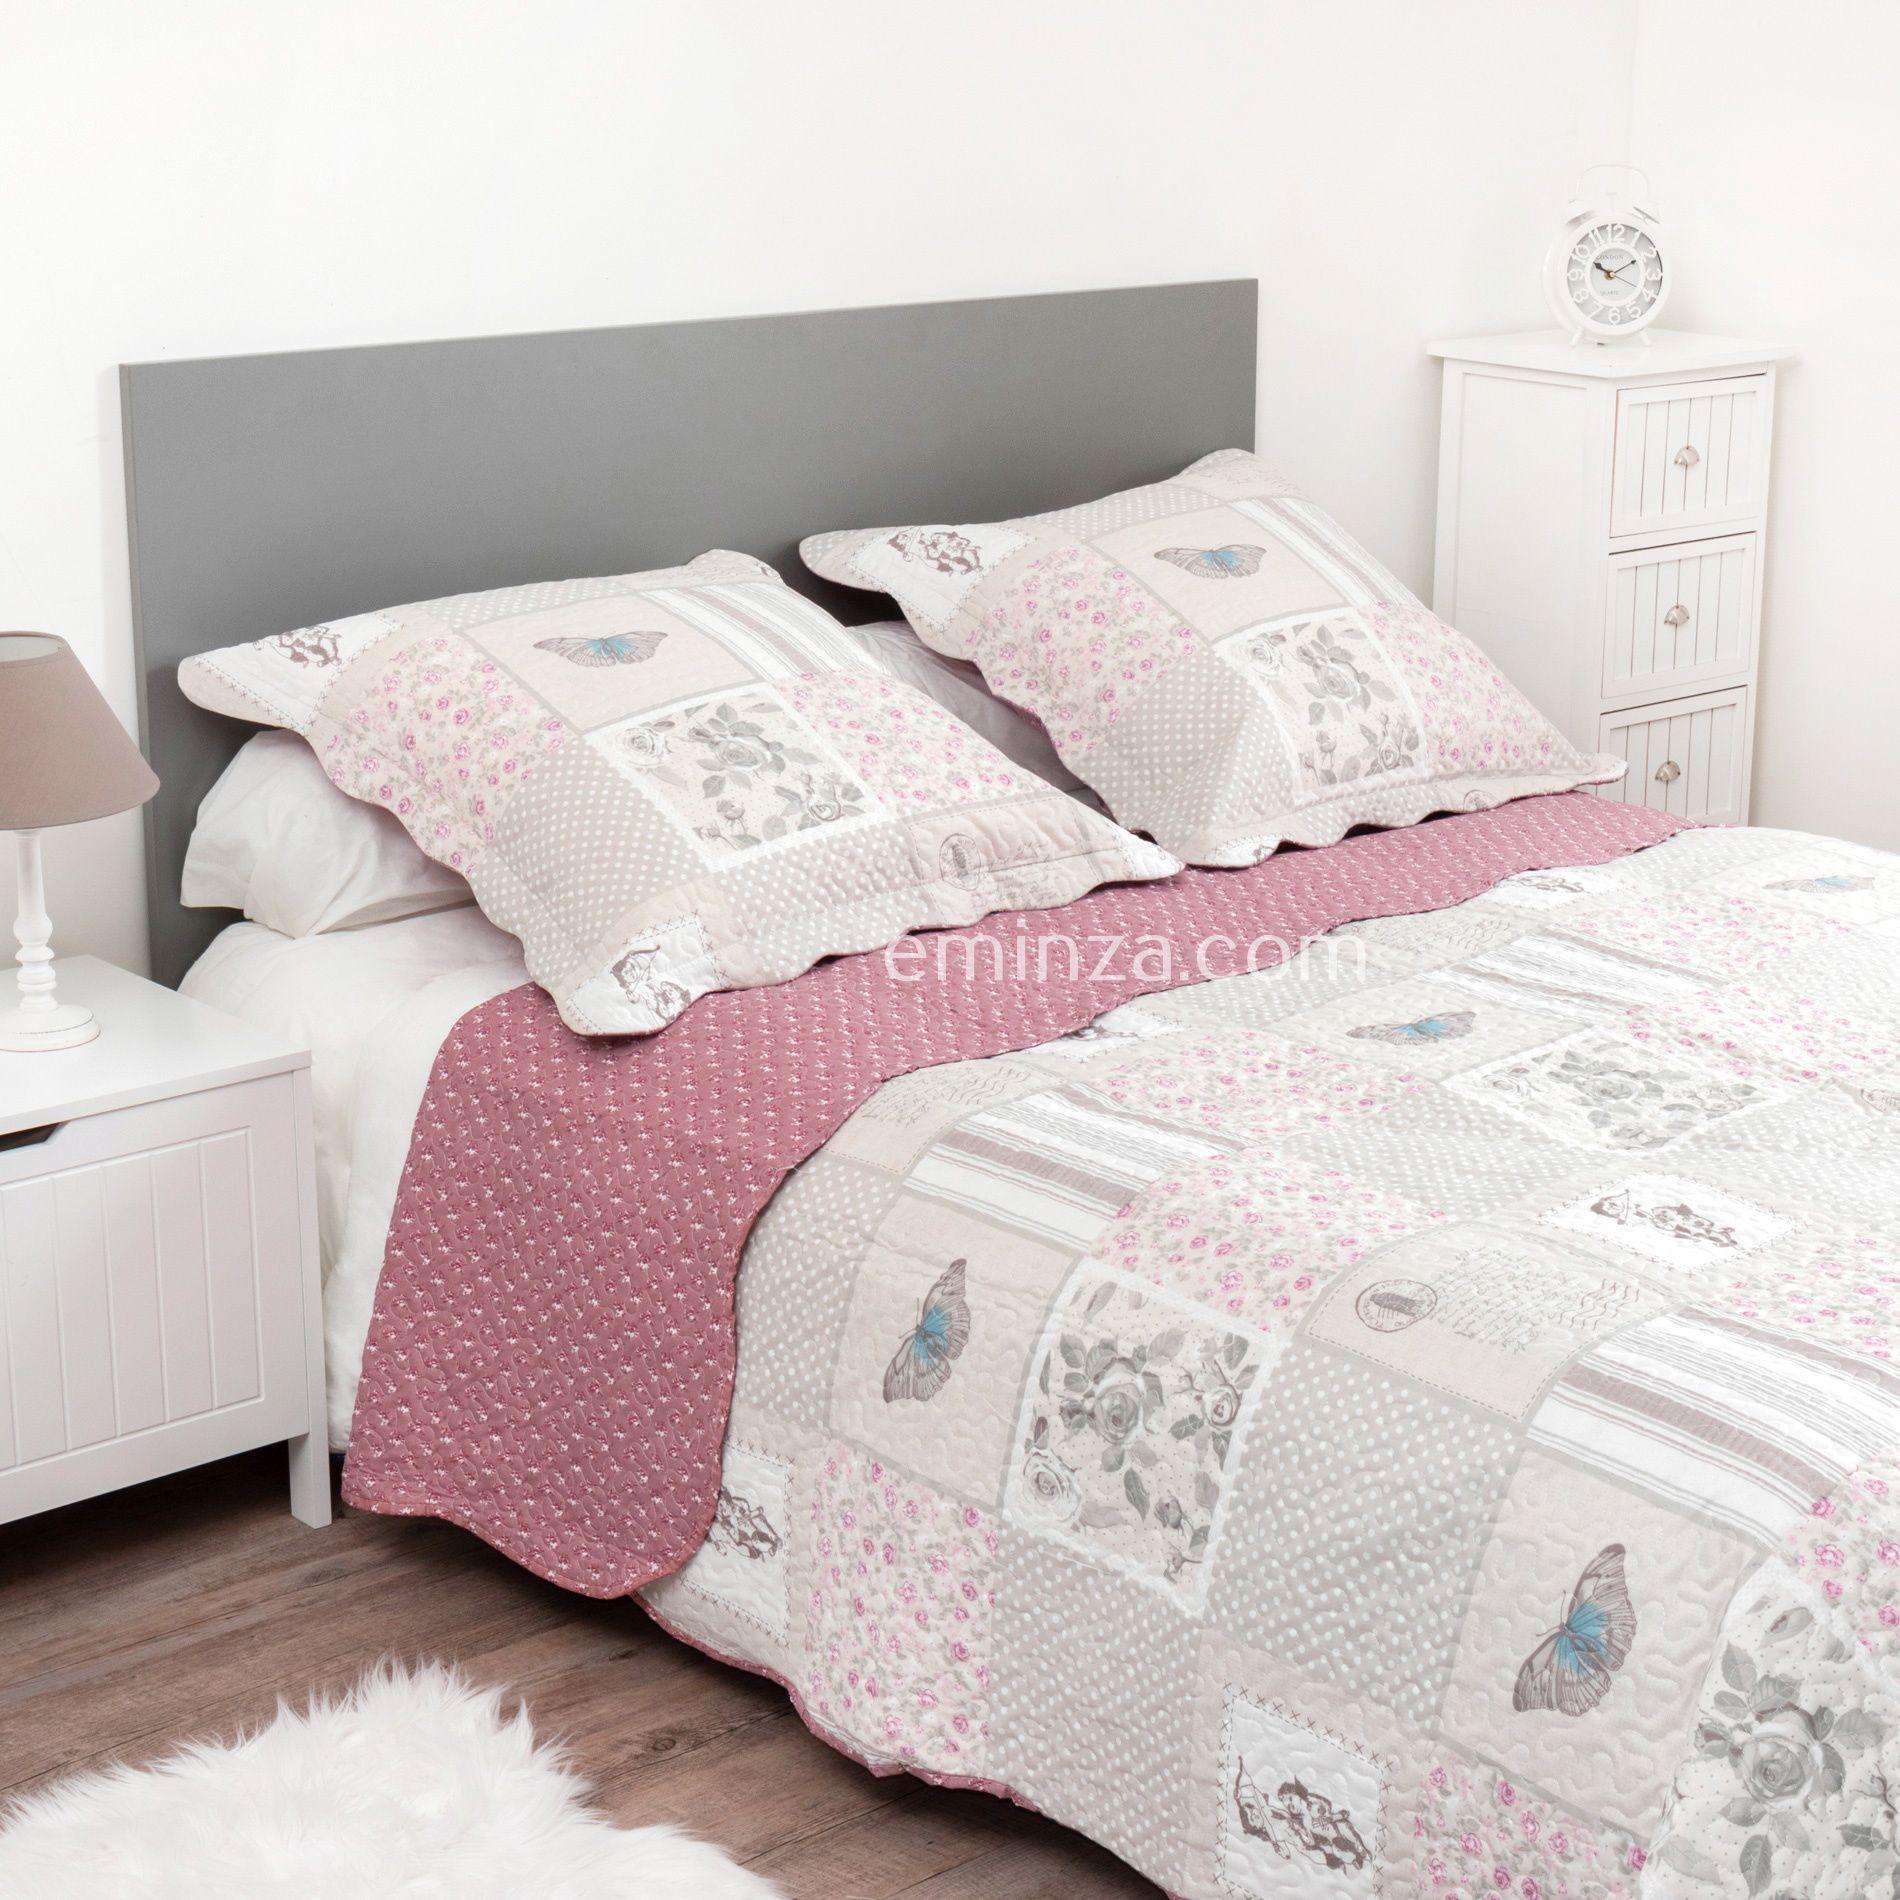 boutis et taies d 39 oreiller 240 x 220 cm anela rose couvre lit boutis eminza. Black Bedroom Furniture Sets. Home Design Ideas